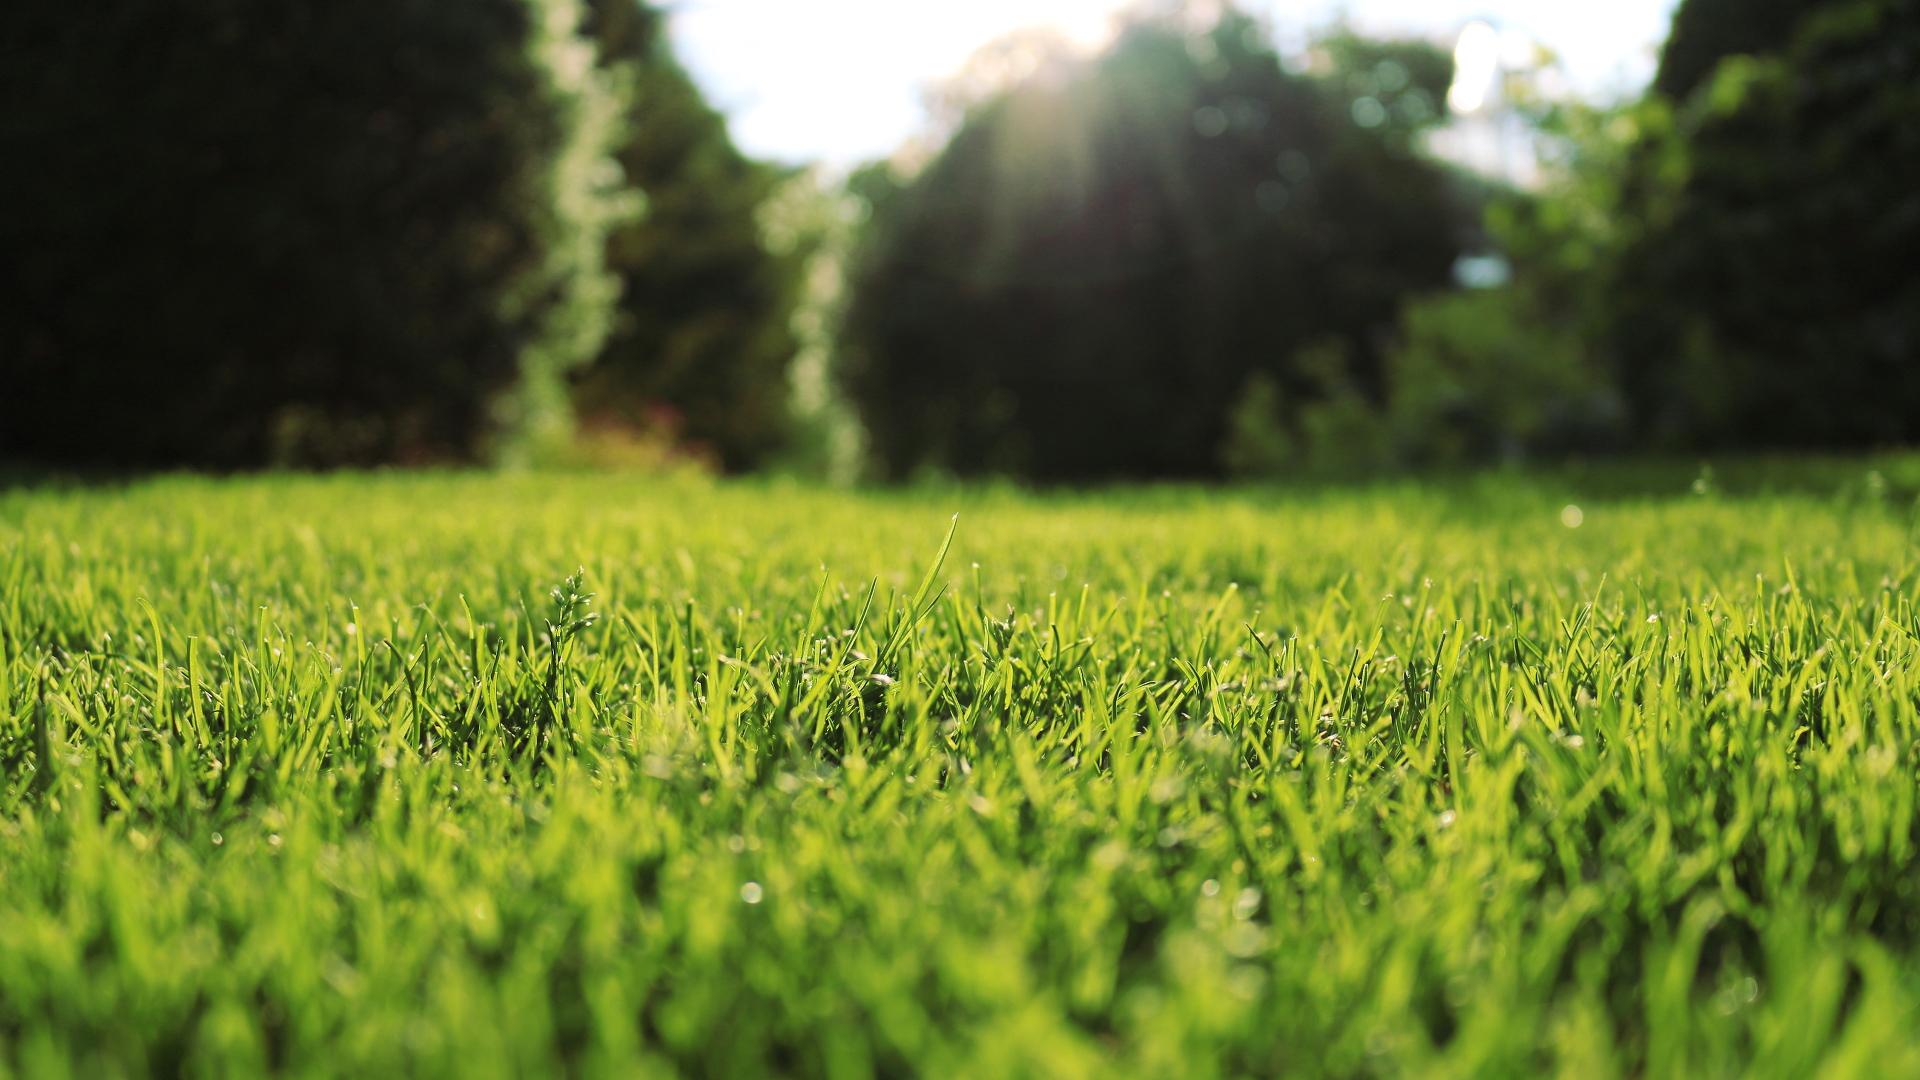 Green Grass Hd Wallpaper Background Image 1920x1080 Id 518733 Wallpaper Abyss